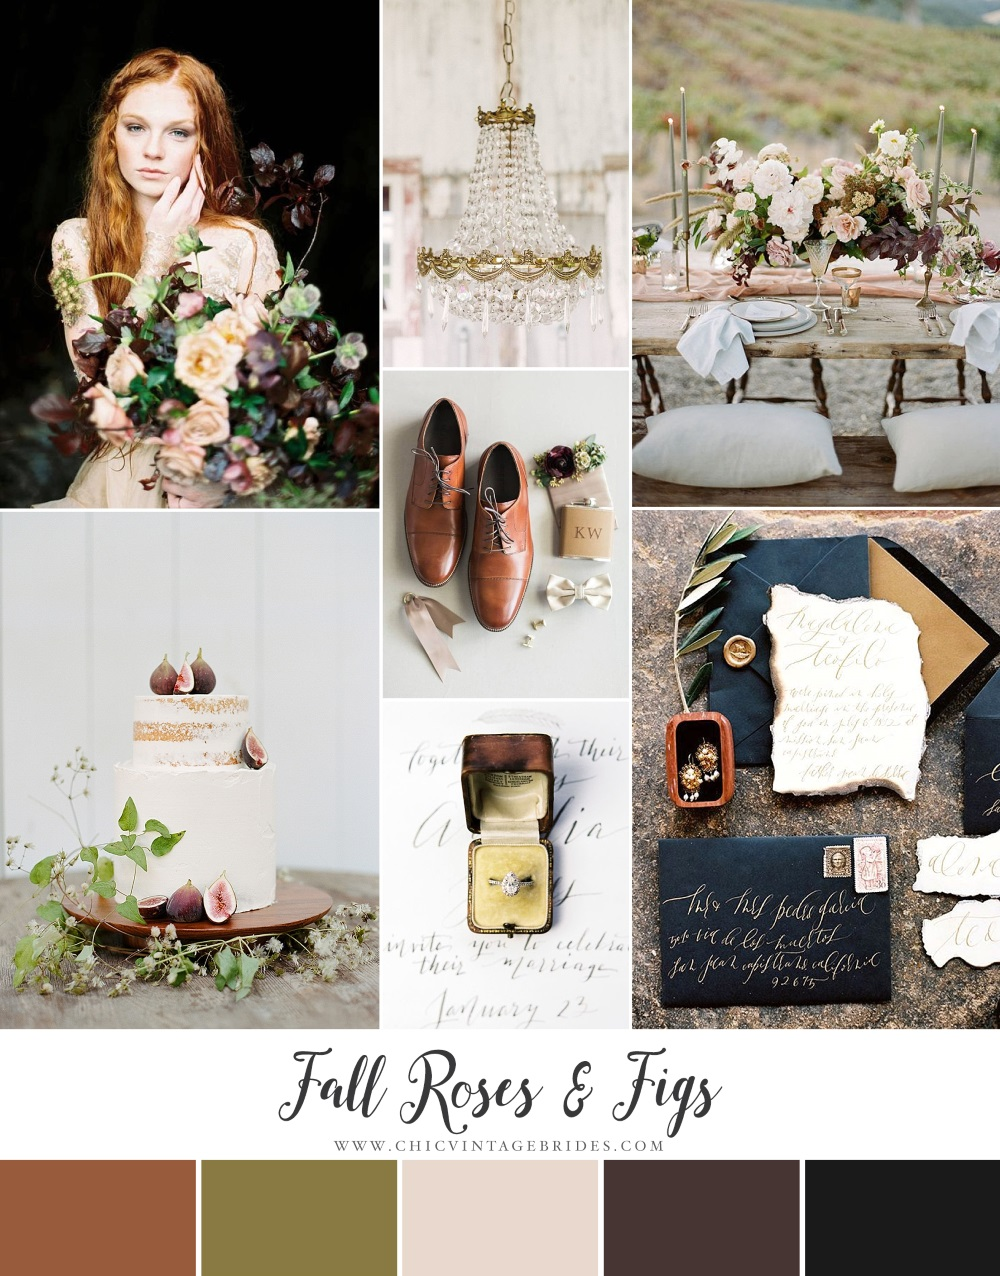 Fall Roses & Figs - Romantic Autumn Winery Wedding Inspiration